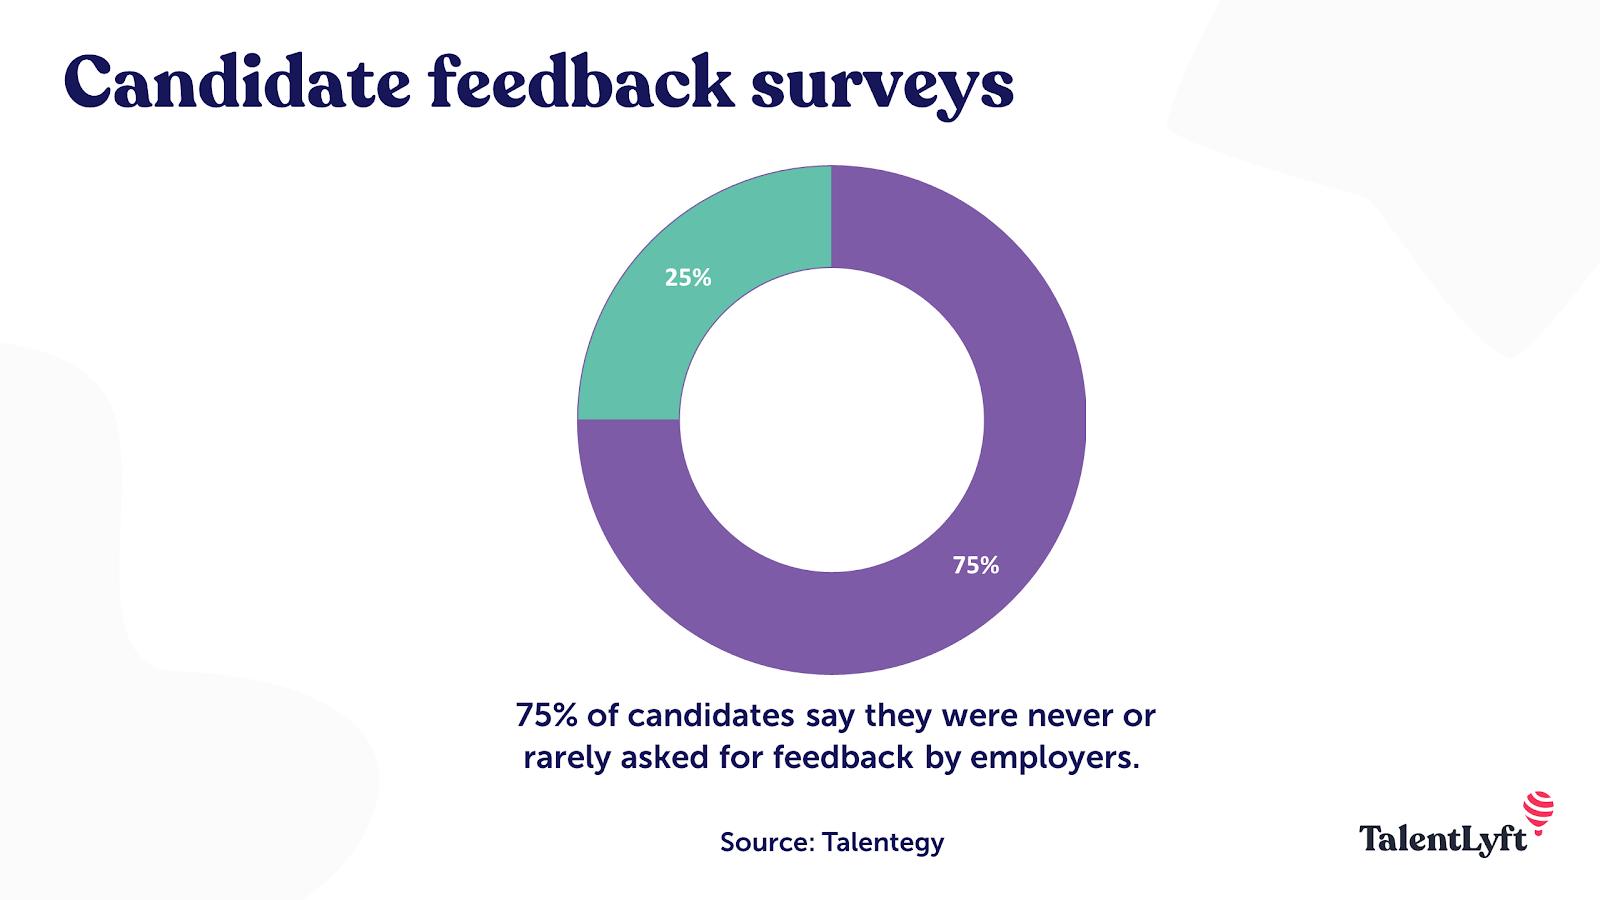 Candidate feedback statistic